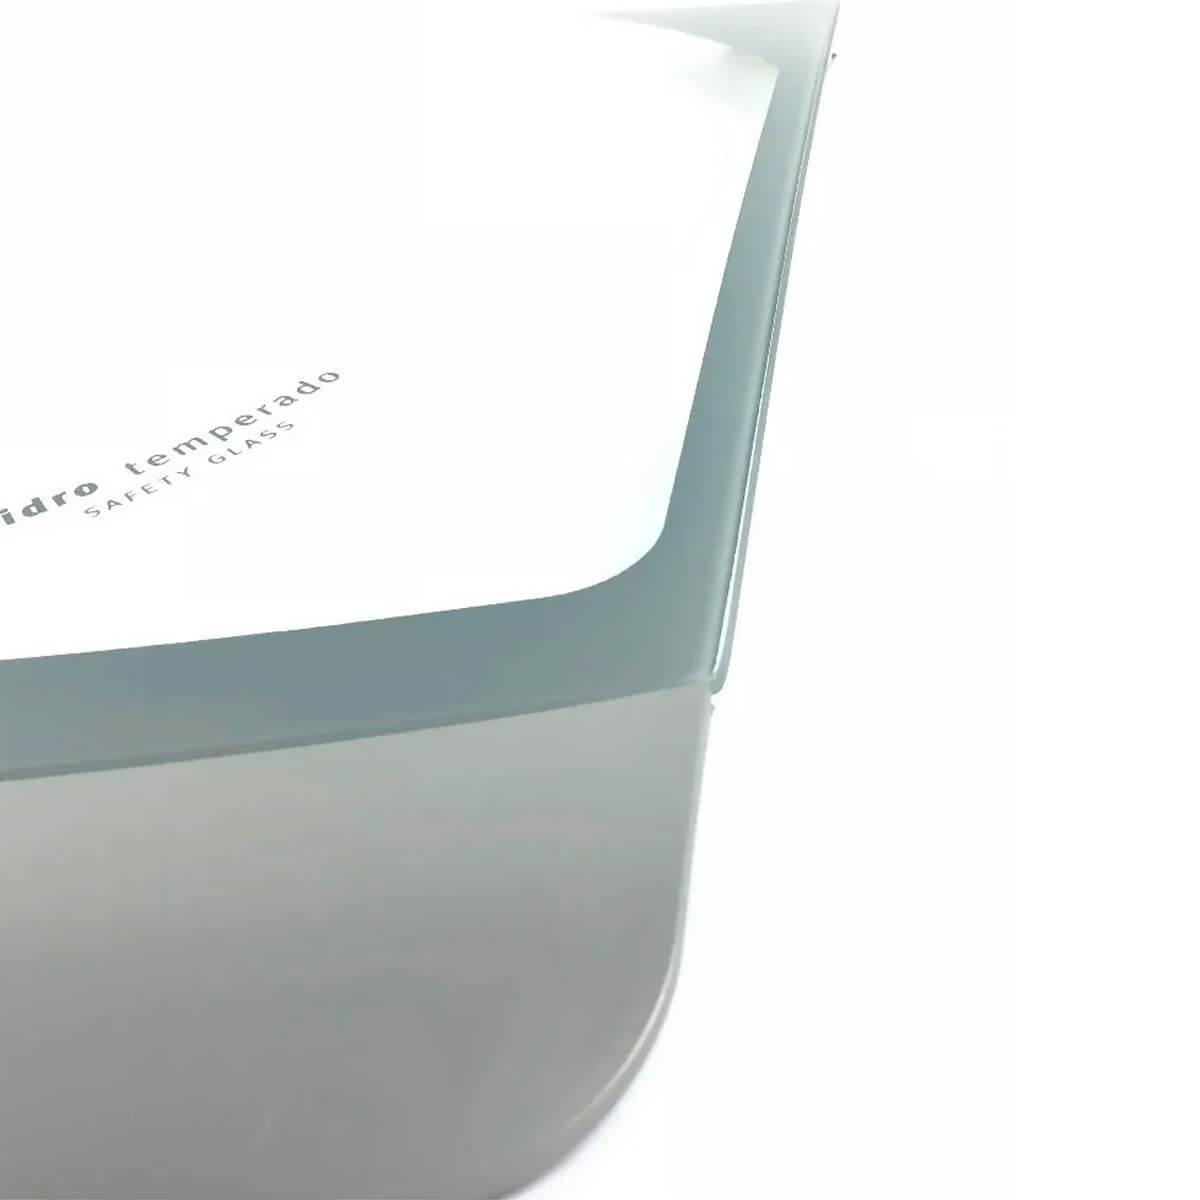 Tampa Móvel De Vidro Para Lavadora Electrolux LTC10 LT11F LUC10 - 63000040